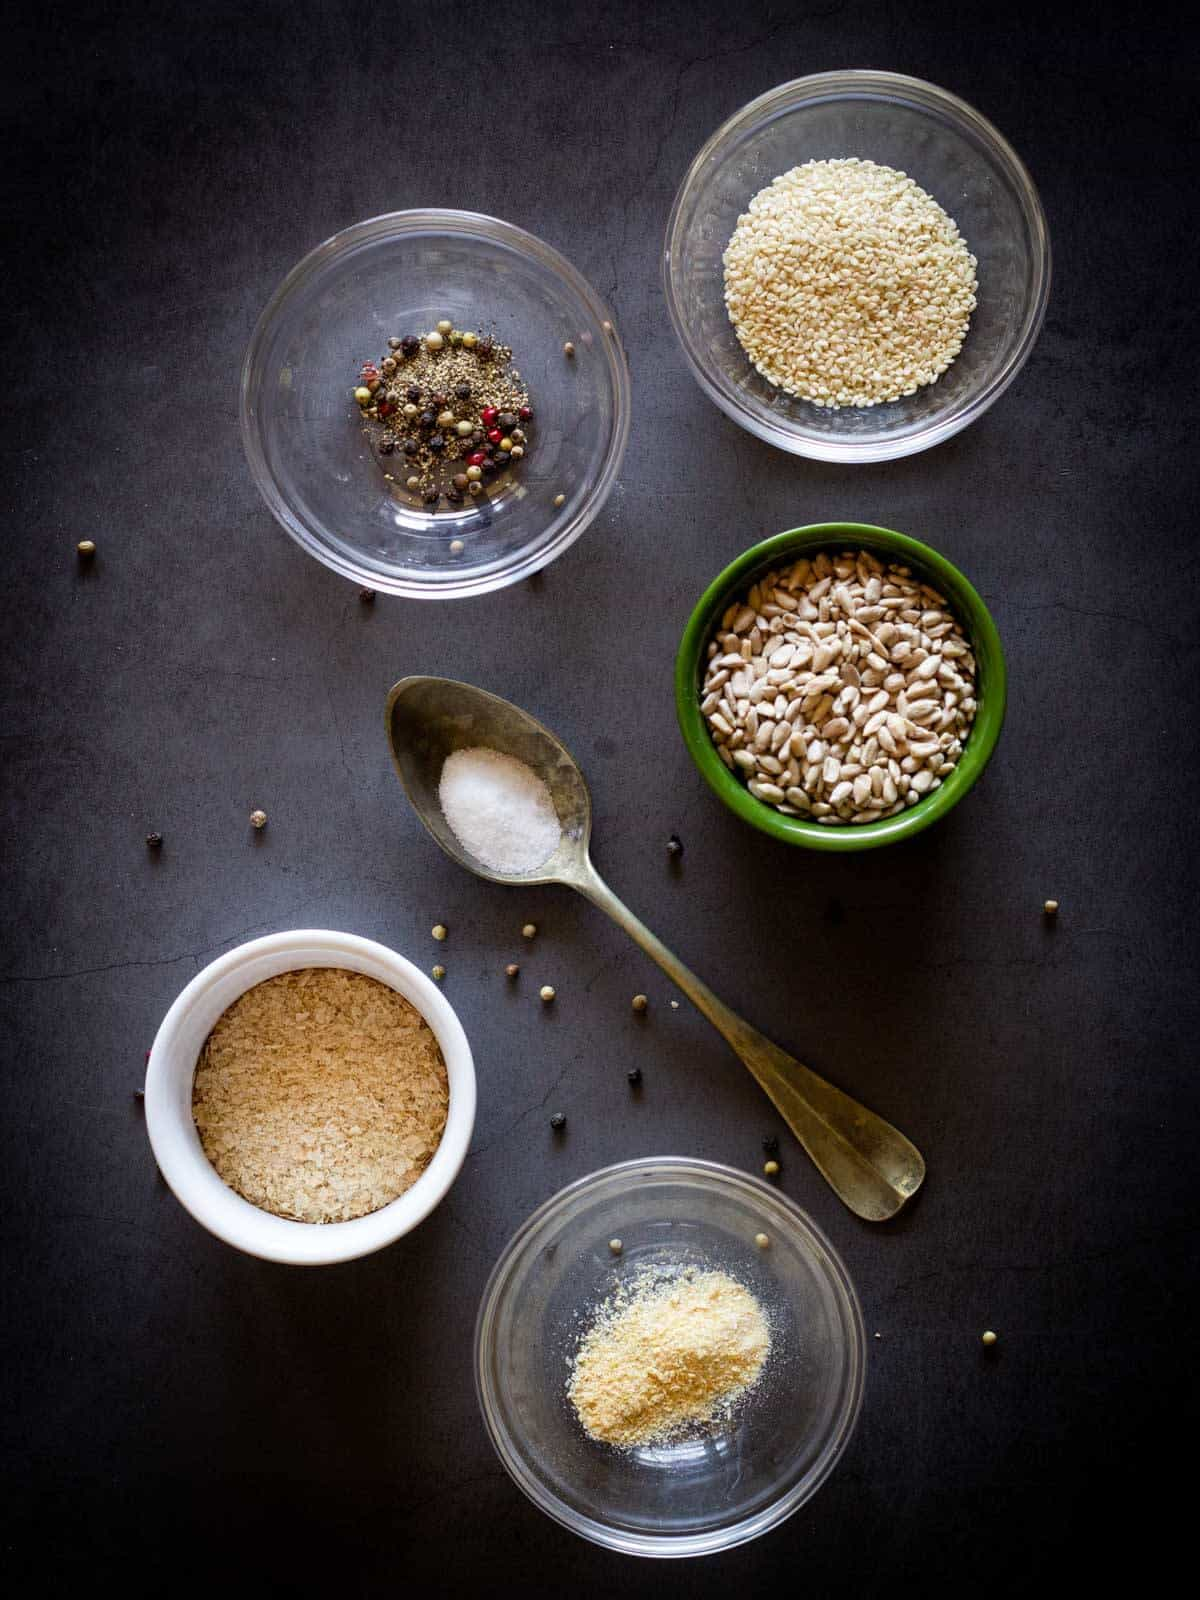 Vegan Parmesan Cheese Ingredients